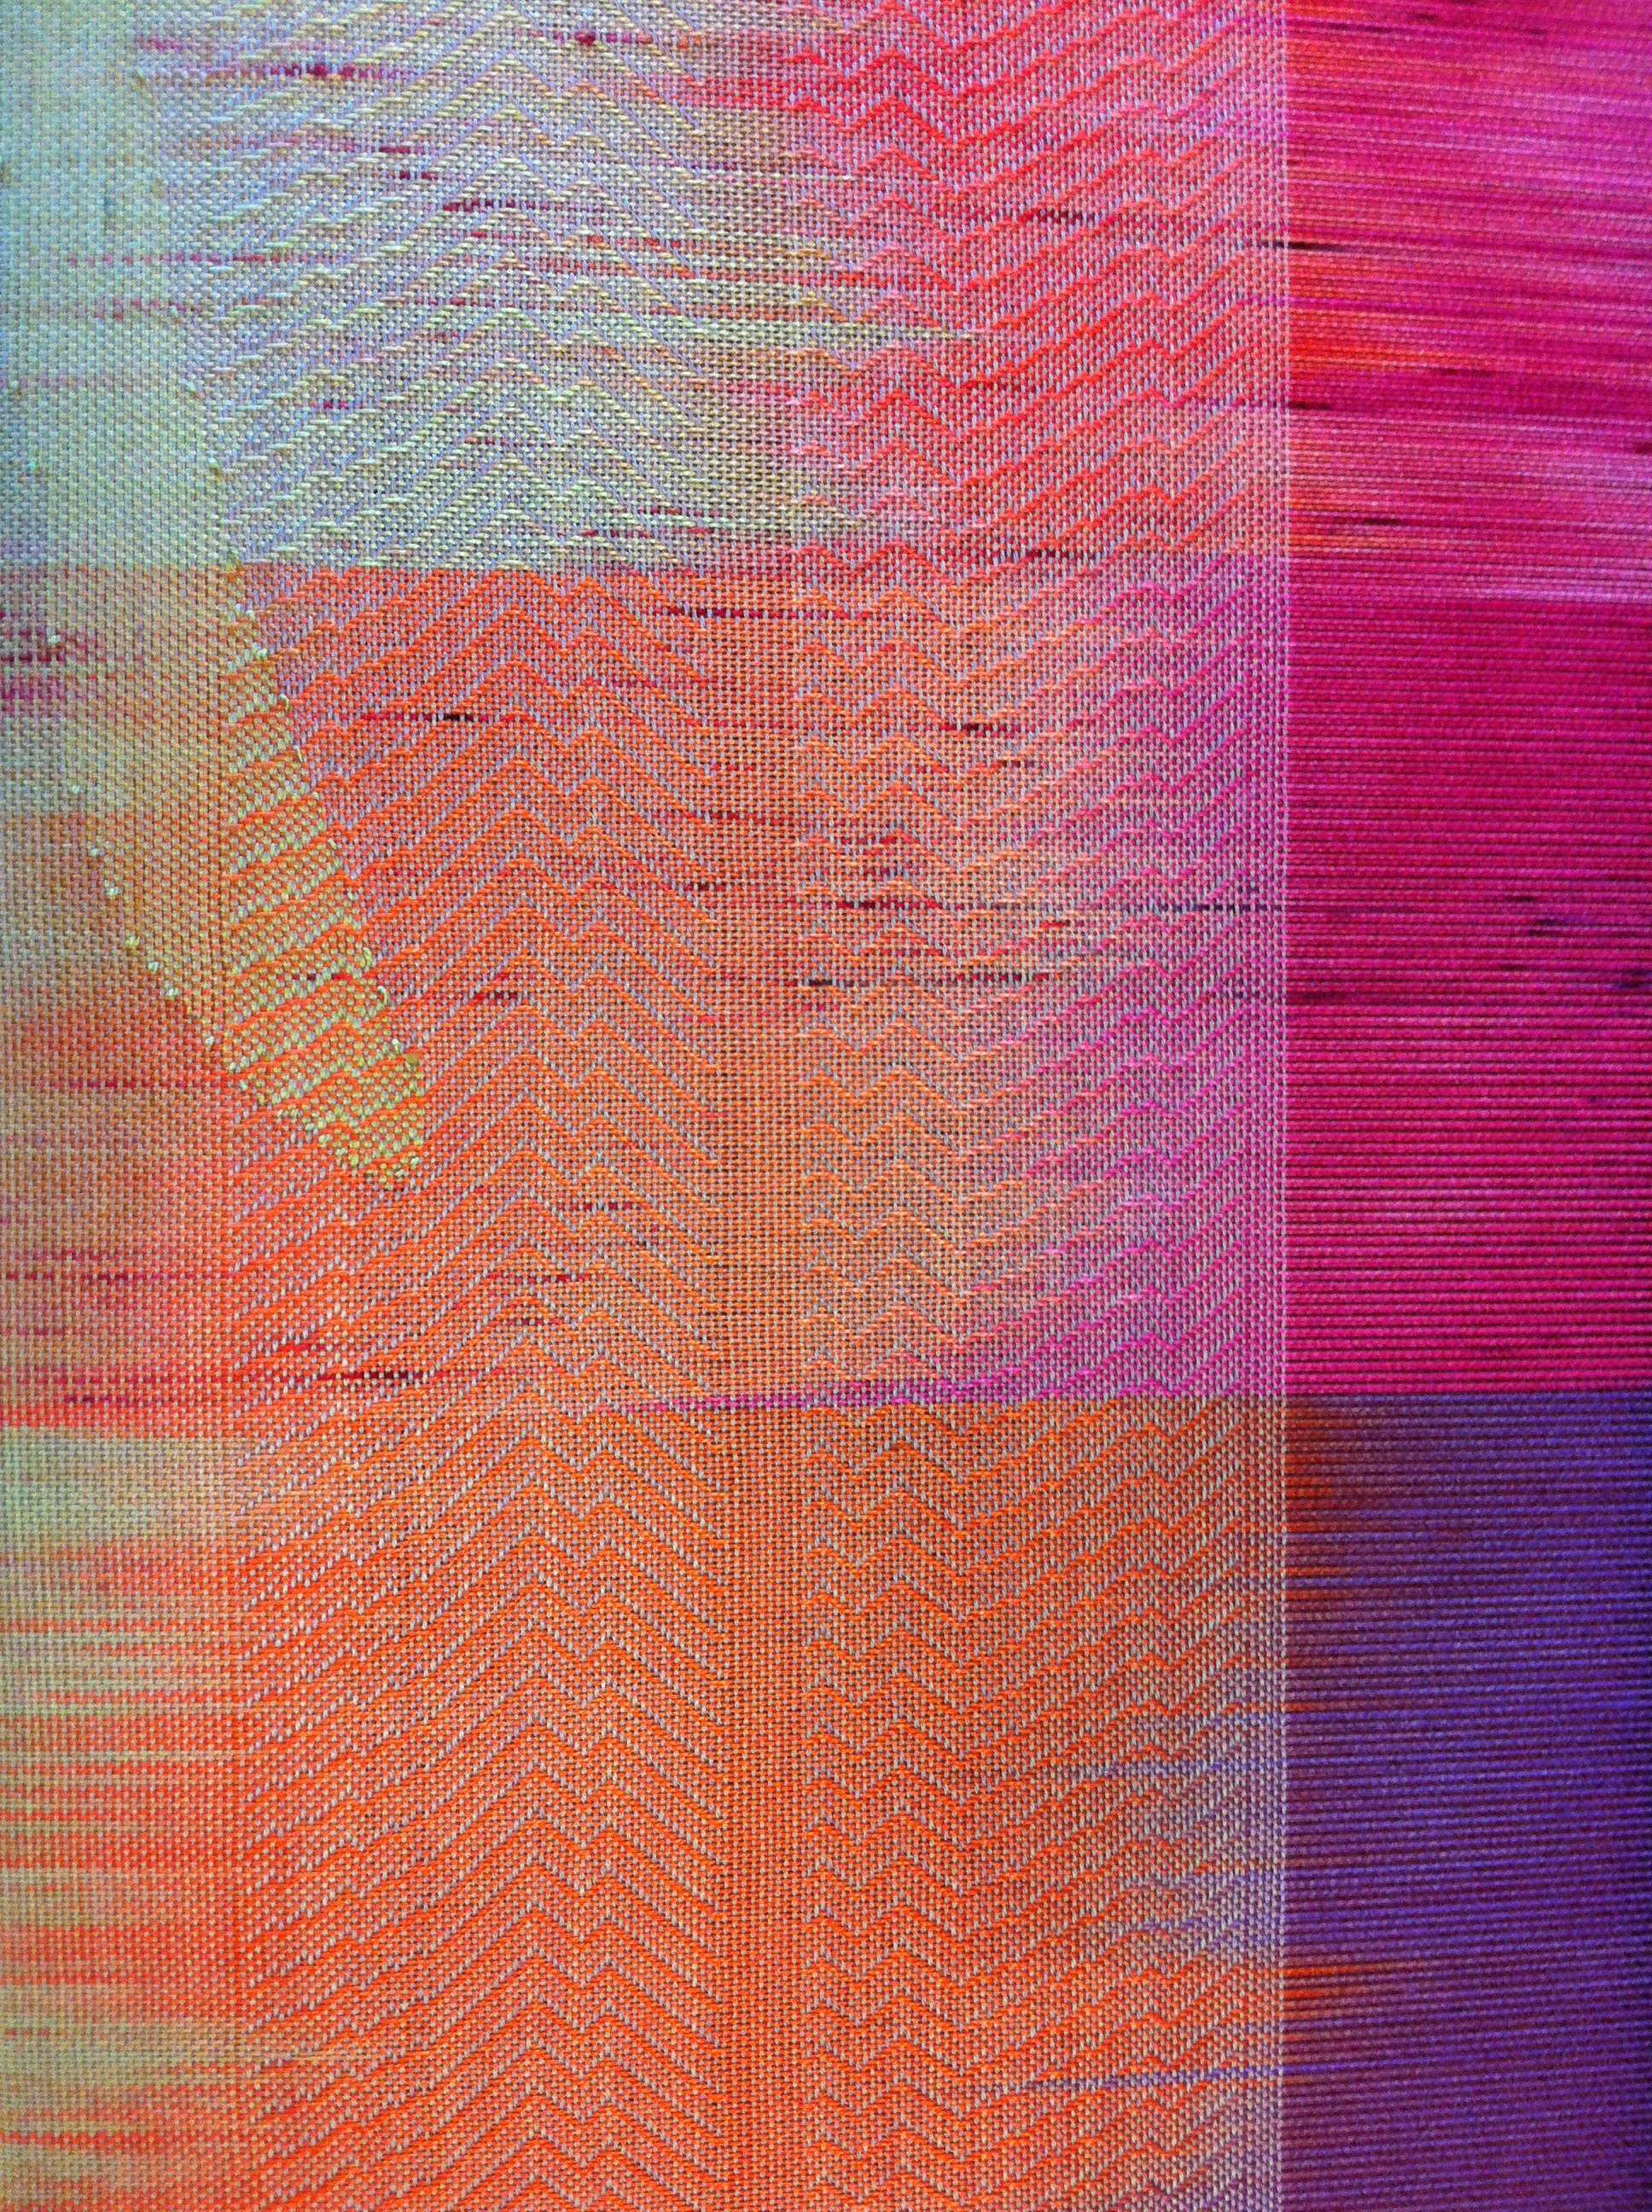 Sound + Silk project